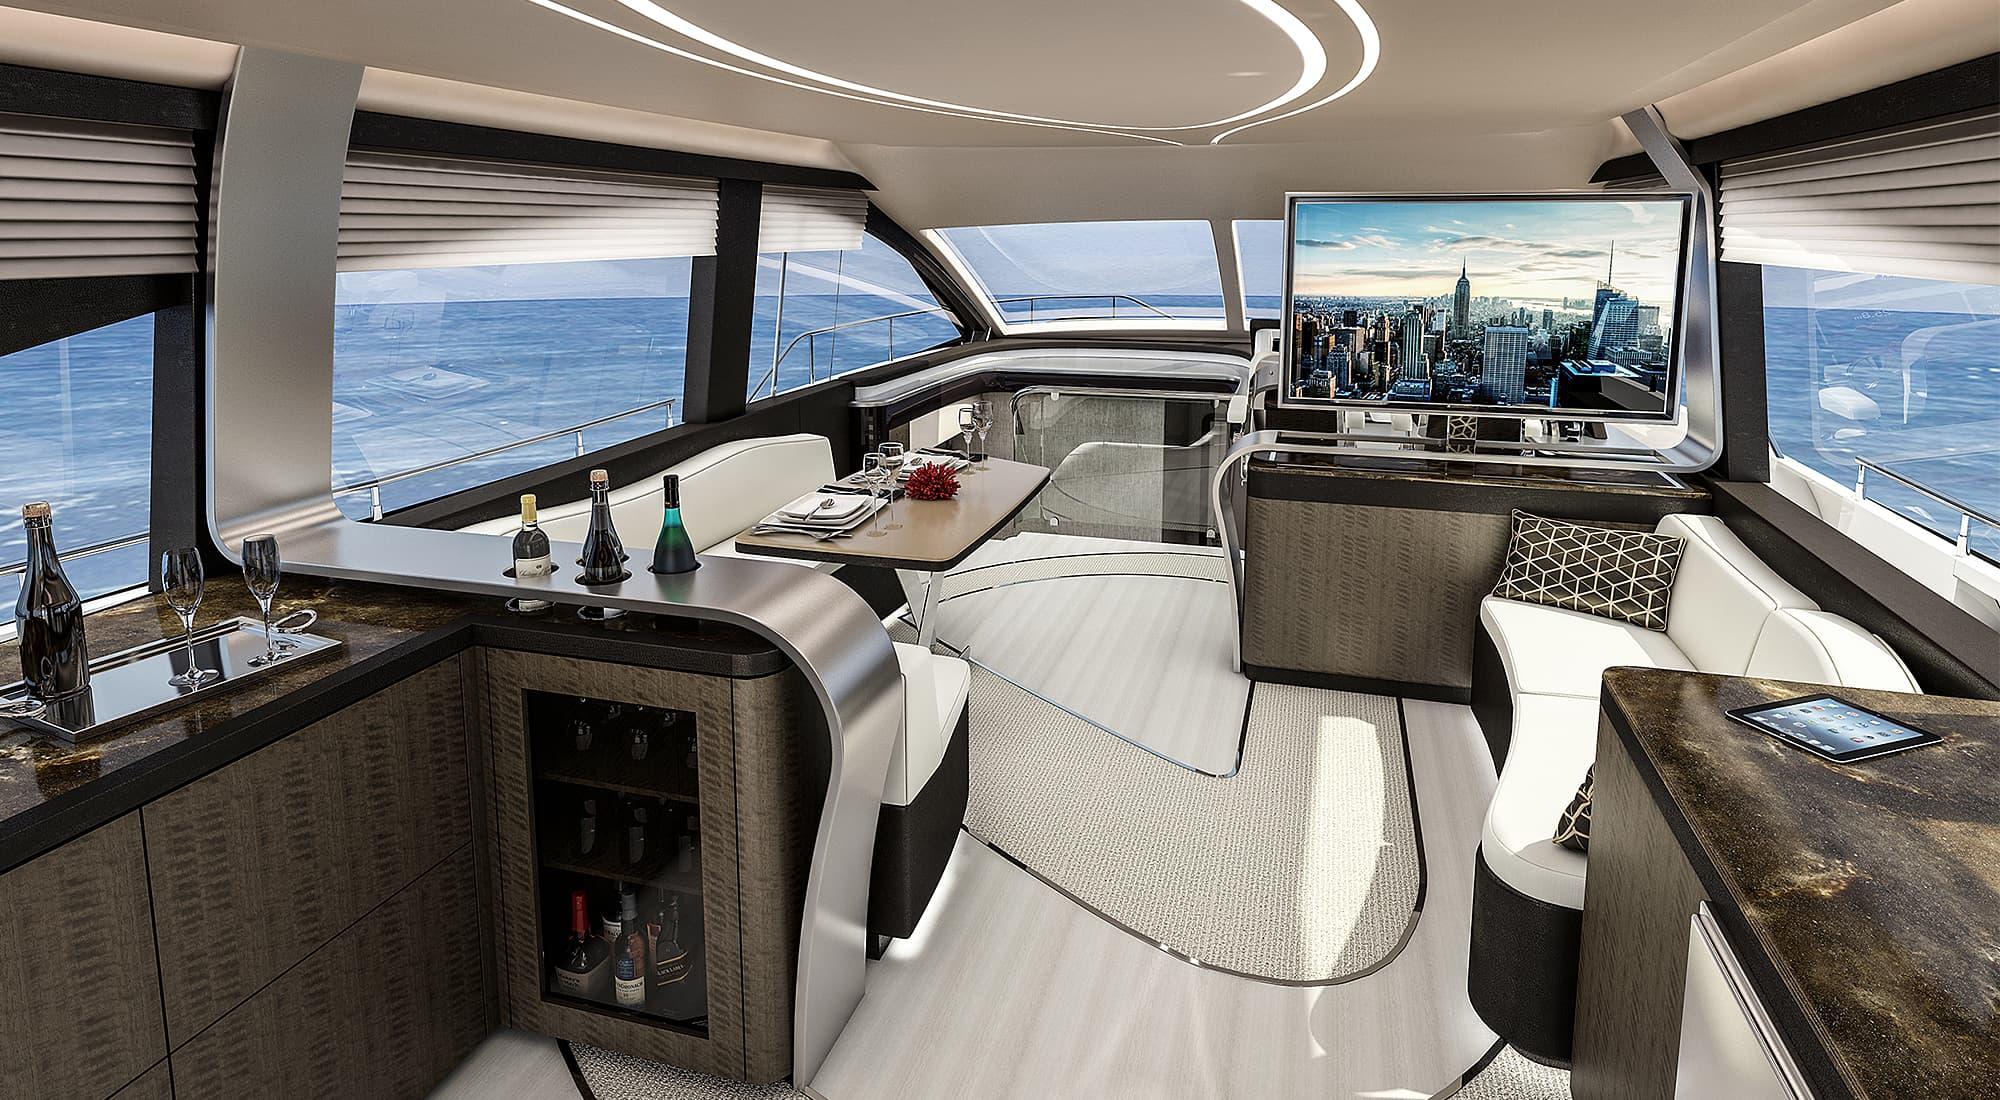 08-Lexus-yacht-2000x1100-salon1_M75.jpg